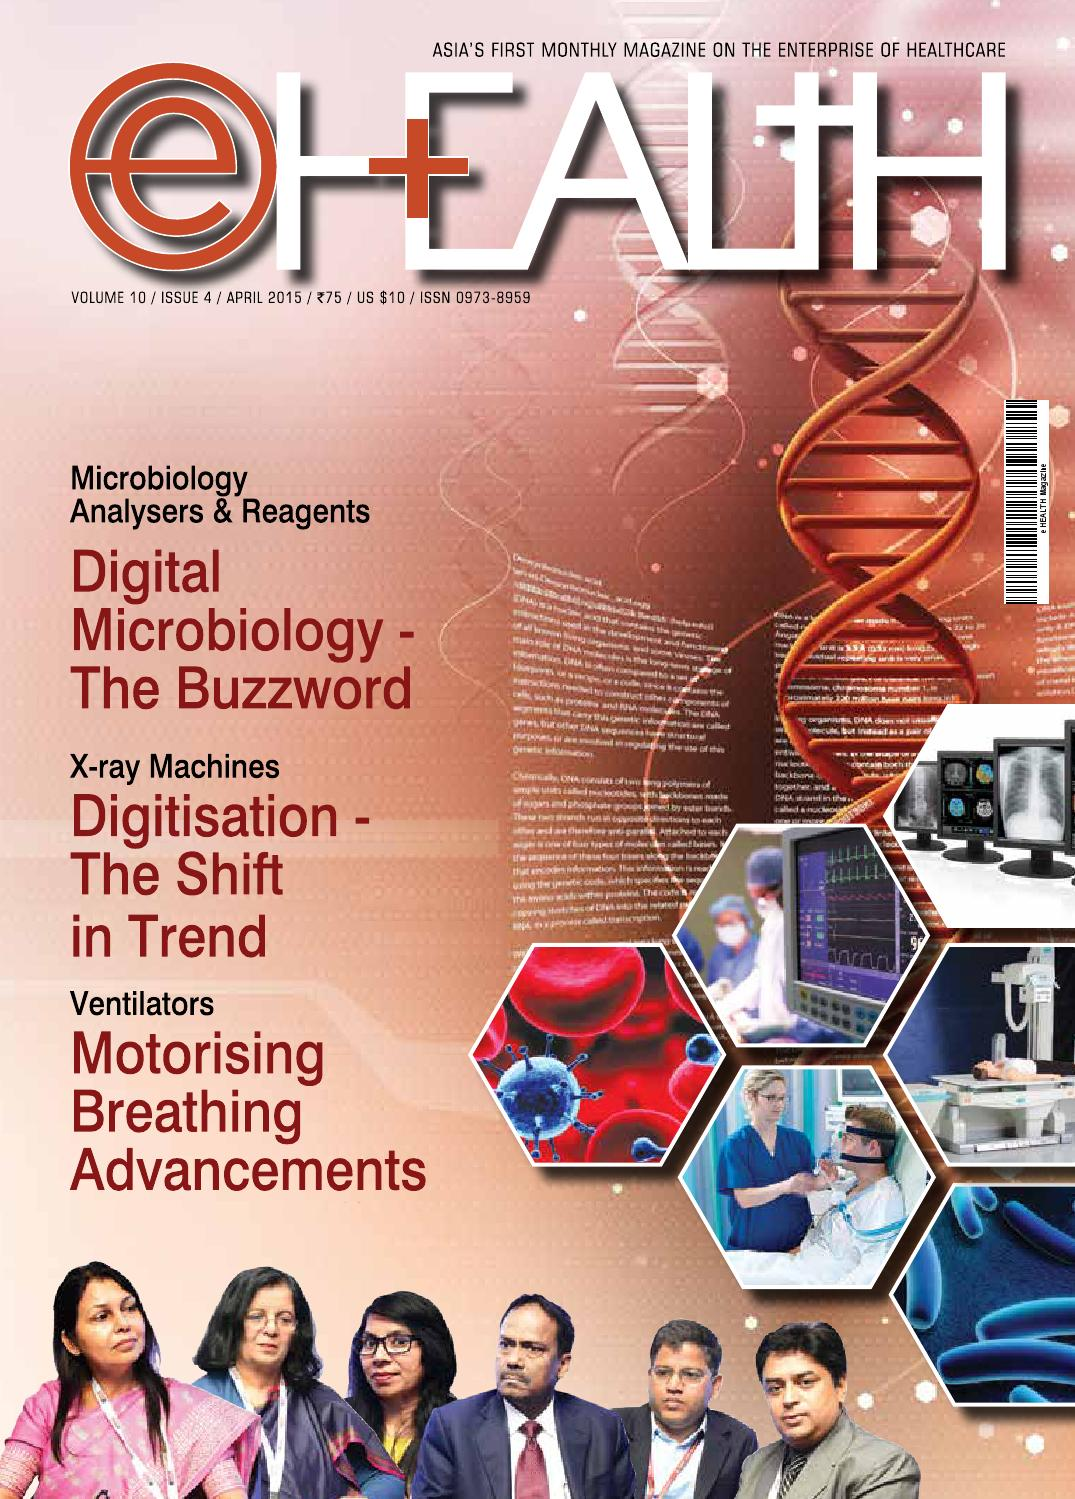 issuu.com - eHealth Magazine - Elets Technomedia Pvt Ltd - eHEALTH April 2015